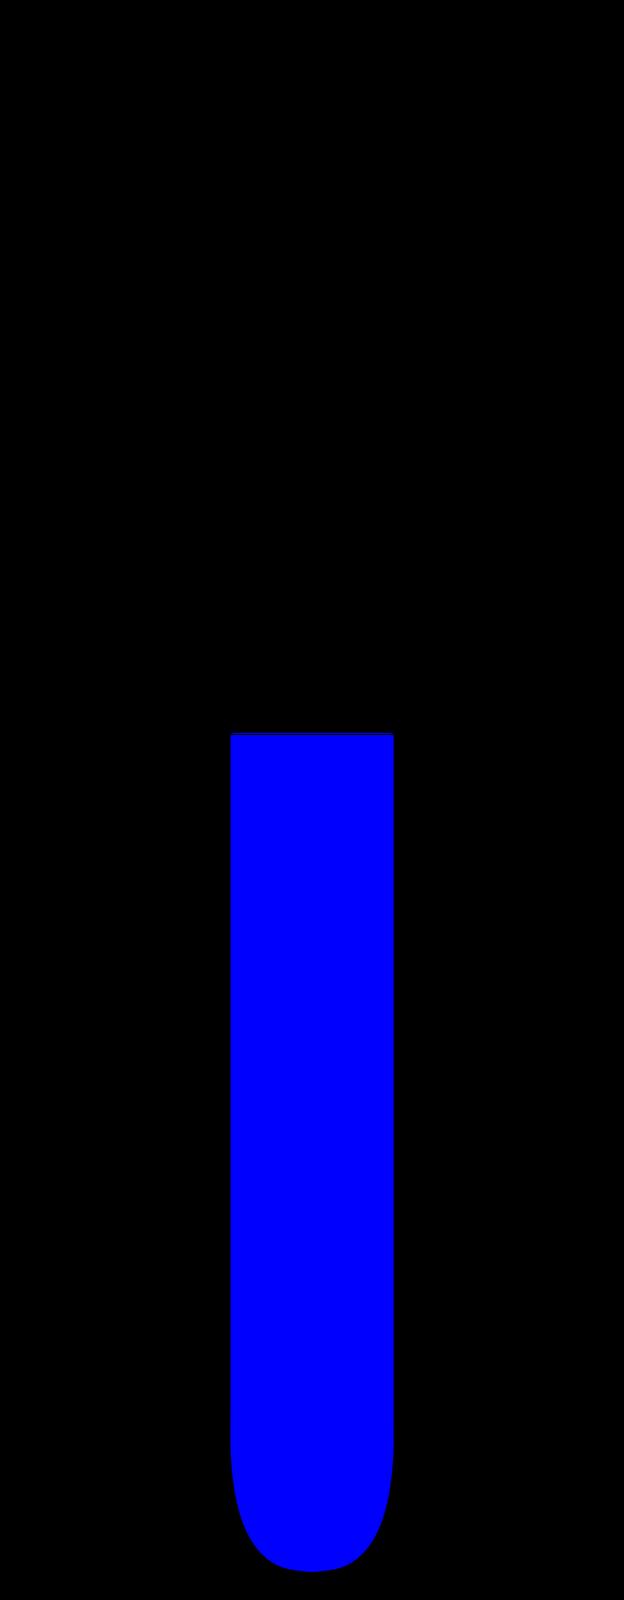 dr bodwin s general chemistry blog aluminum hcl experiment figure 1 a half full test tube